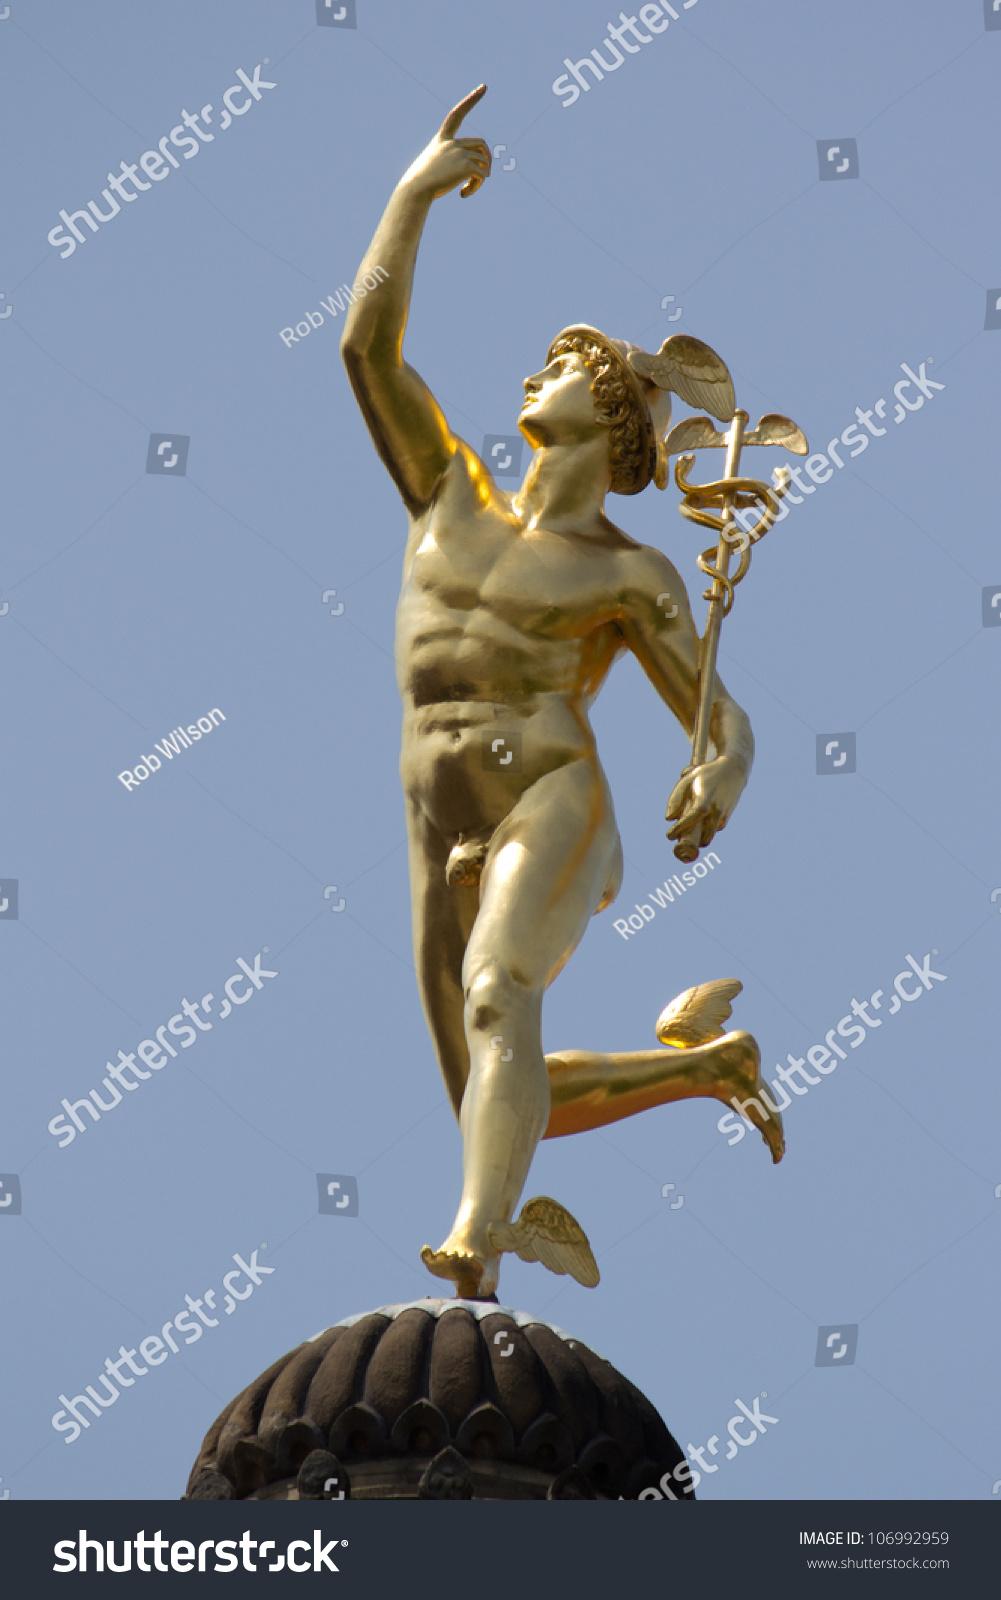 Stuttgart Germany June 30 Statue Roman Stock Photo ...